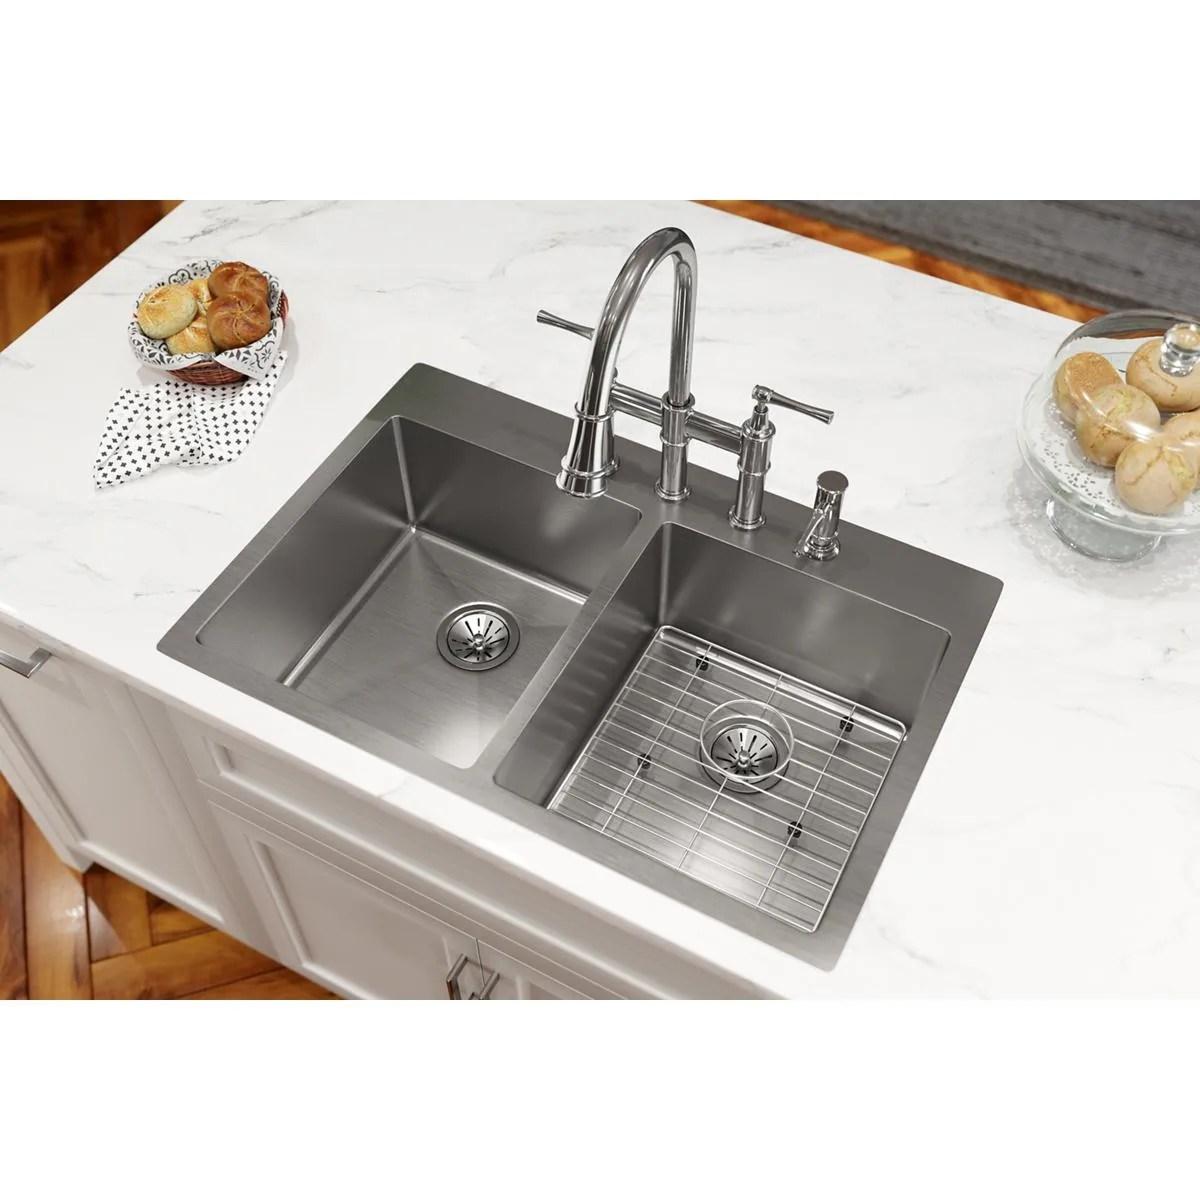 elkay crosstown stainless steel 33 x 22 x 9 equal double bowl dual mount sink kit